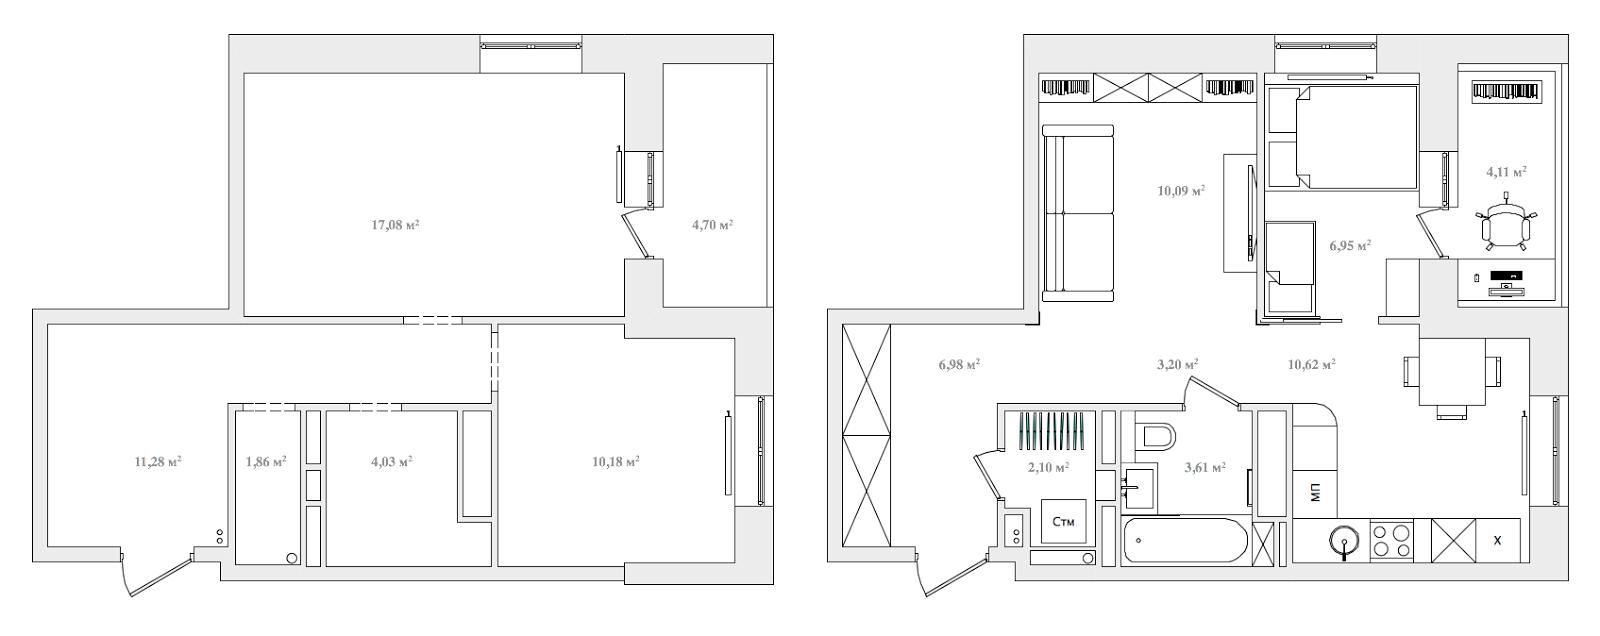 Дизайн малогабаритной двухкомнатной квартиры 37 кв м